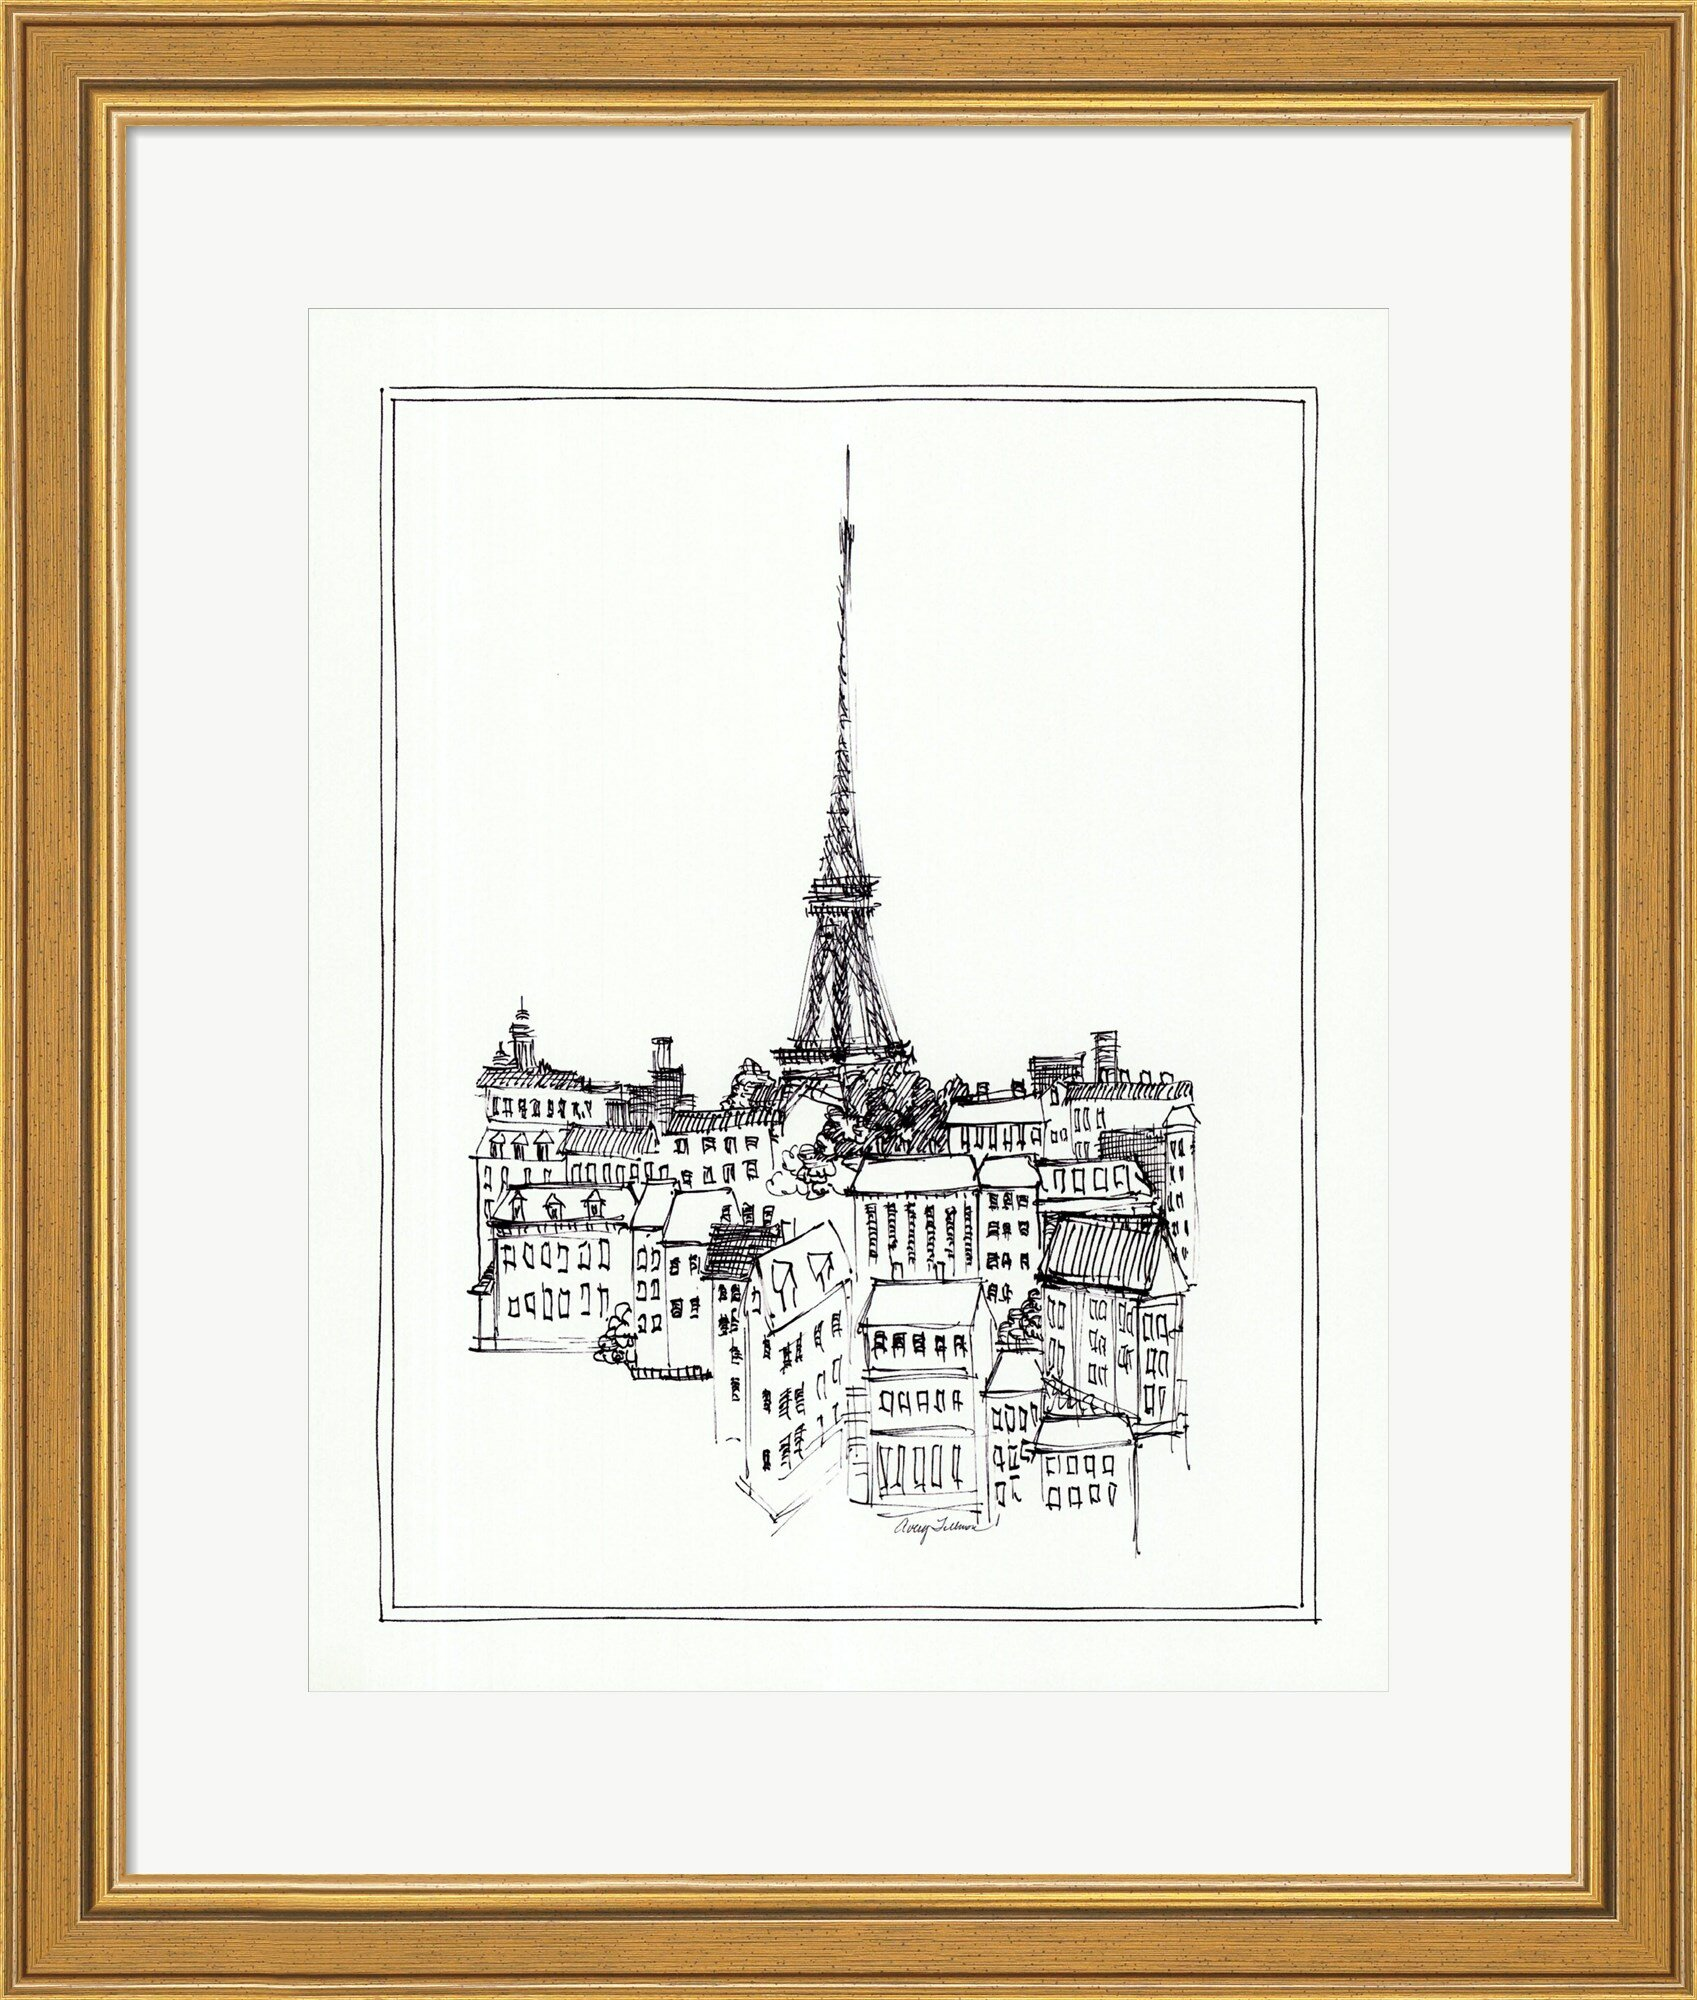 Eiffel tower framed graphic art print reviews joss main eiffel tower framed graphic art print reviews joss main jeuxipadfo Images